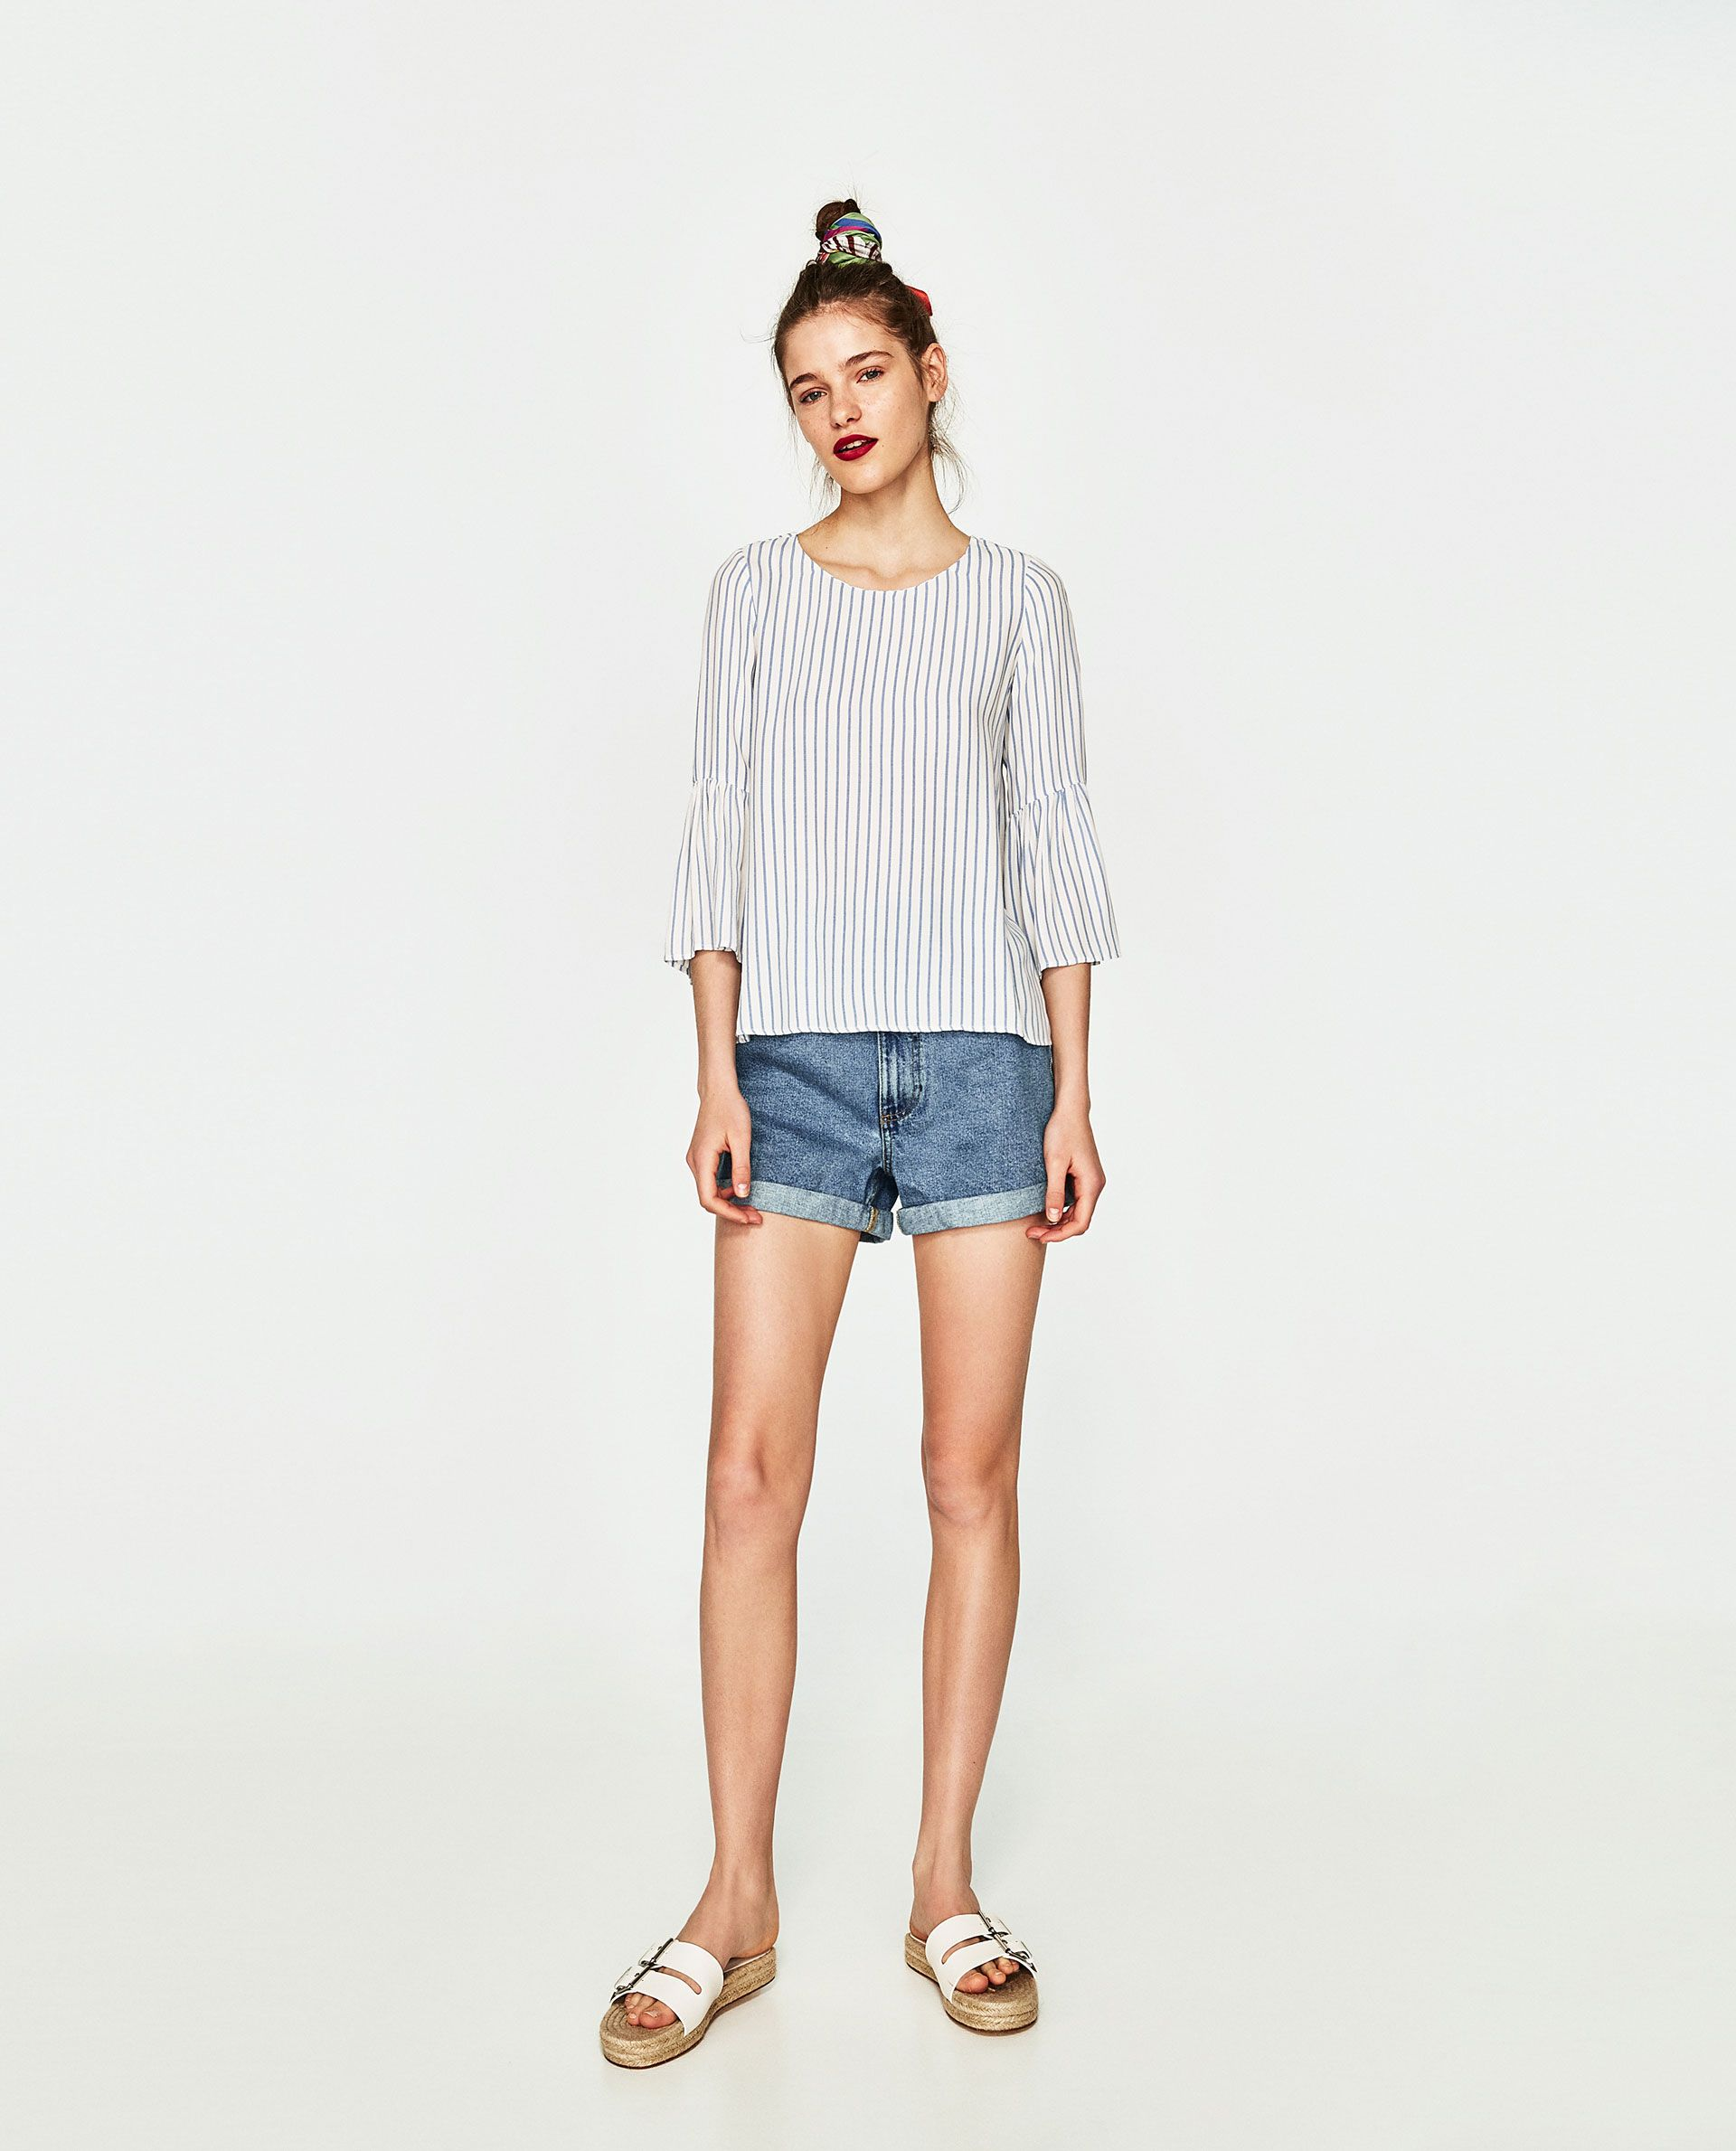 ed07ba29 CUERPO RAYAS MANGA VOLANTE   Summer 2017   Diseños de blusa ...